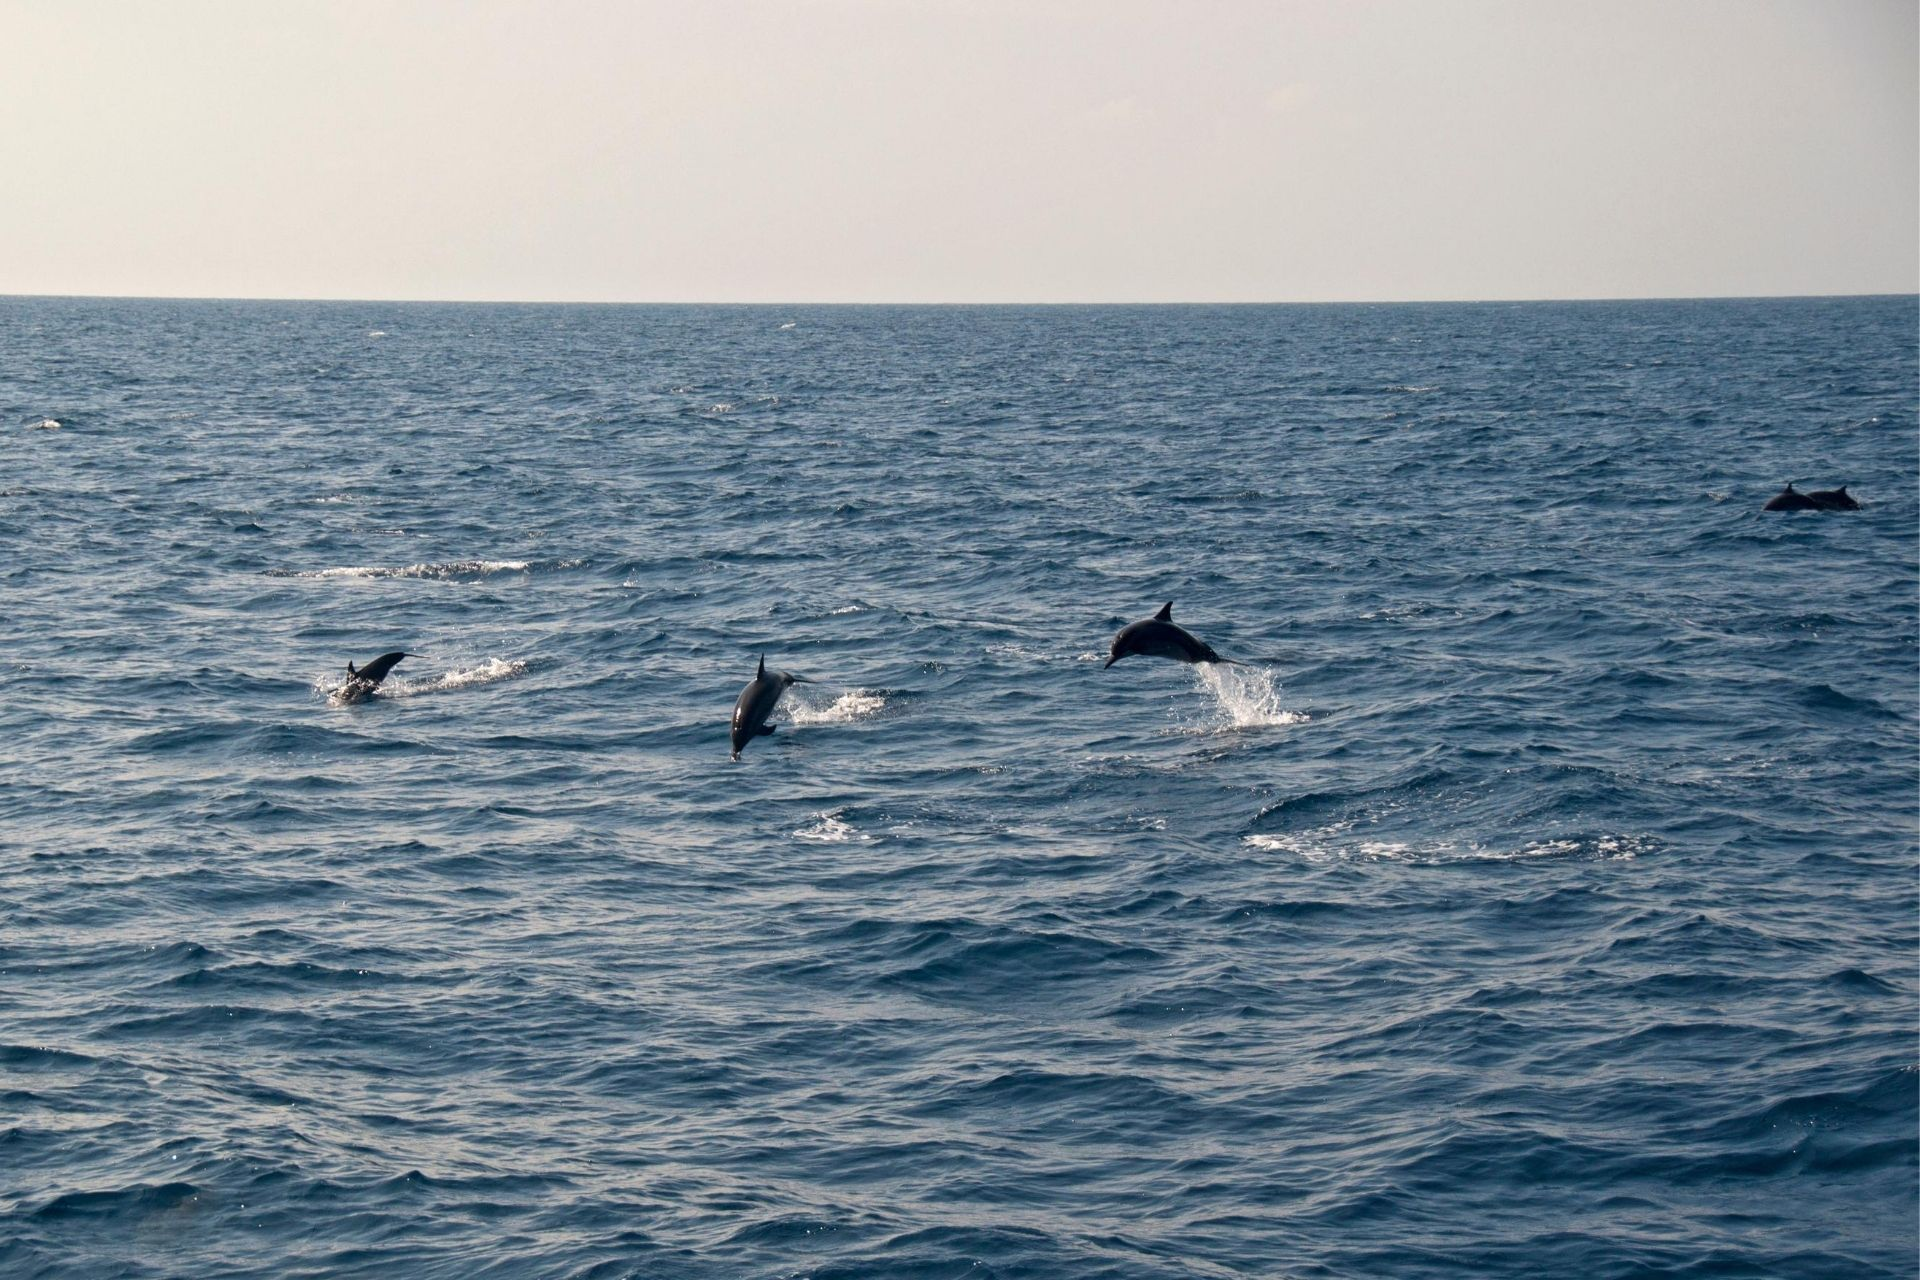 Maldives Sunset Dolphin Cruise Picnic